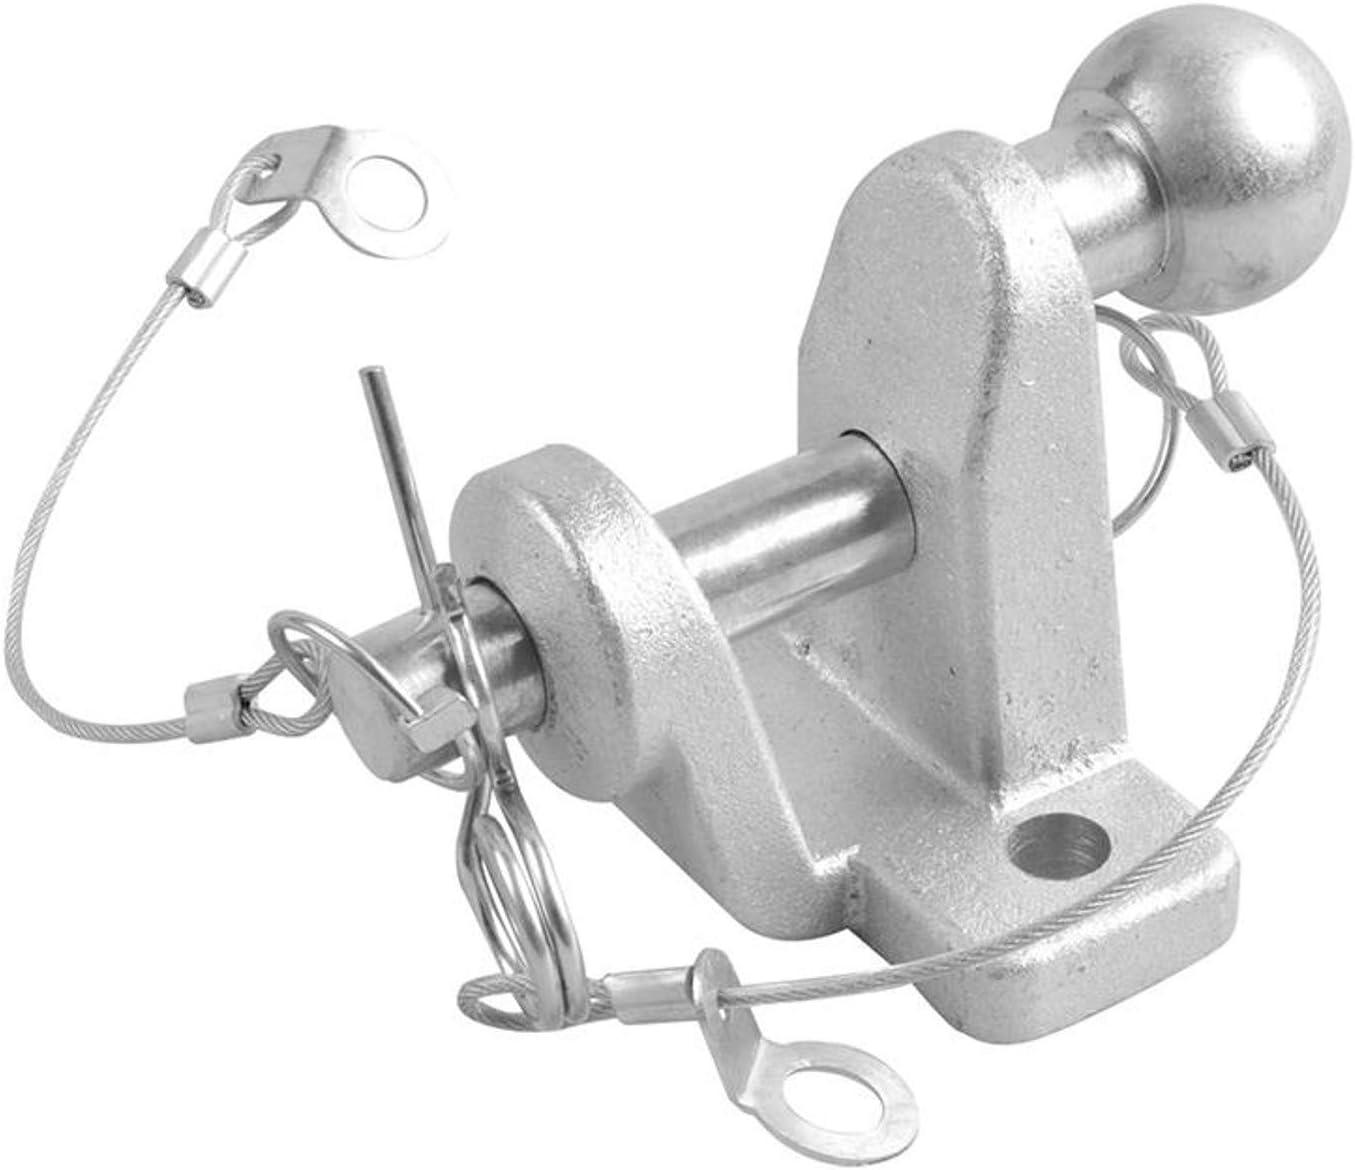 Kugelkopf Anhänger Kupplungskugel doppelte Ausführung 50mm Kupplungskugel 3,5t